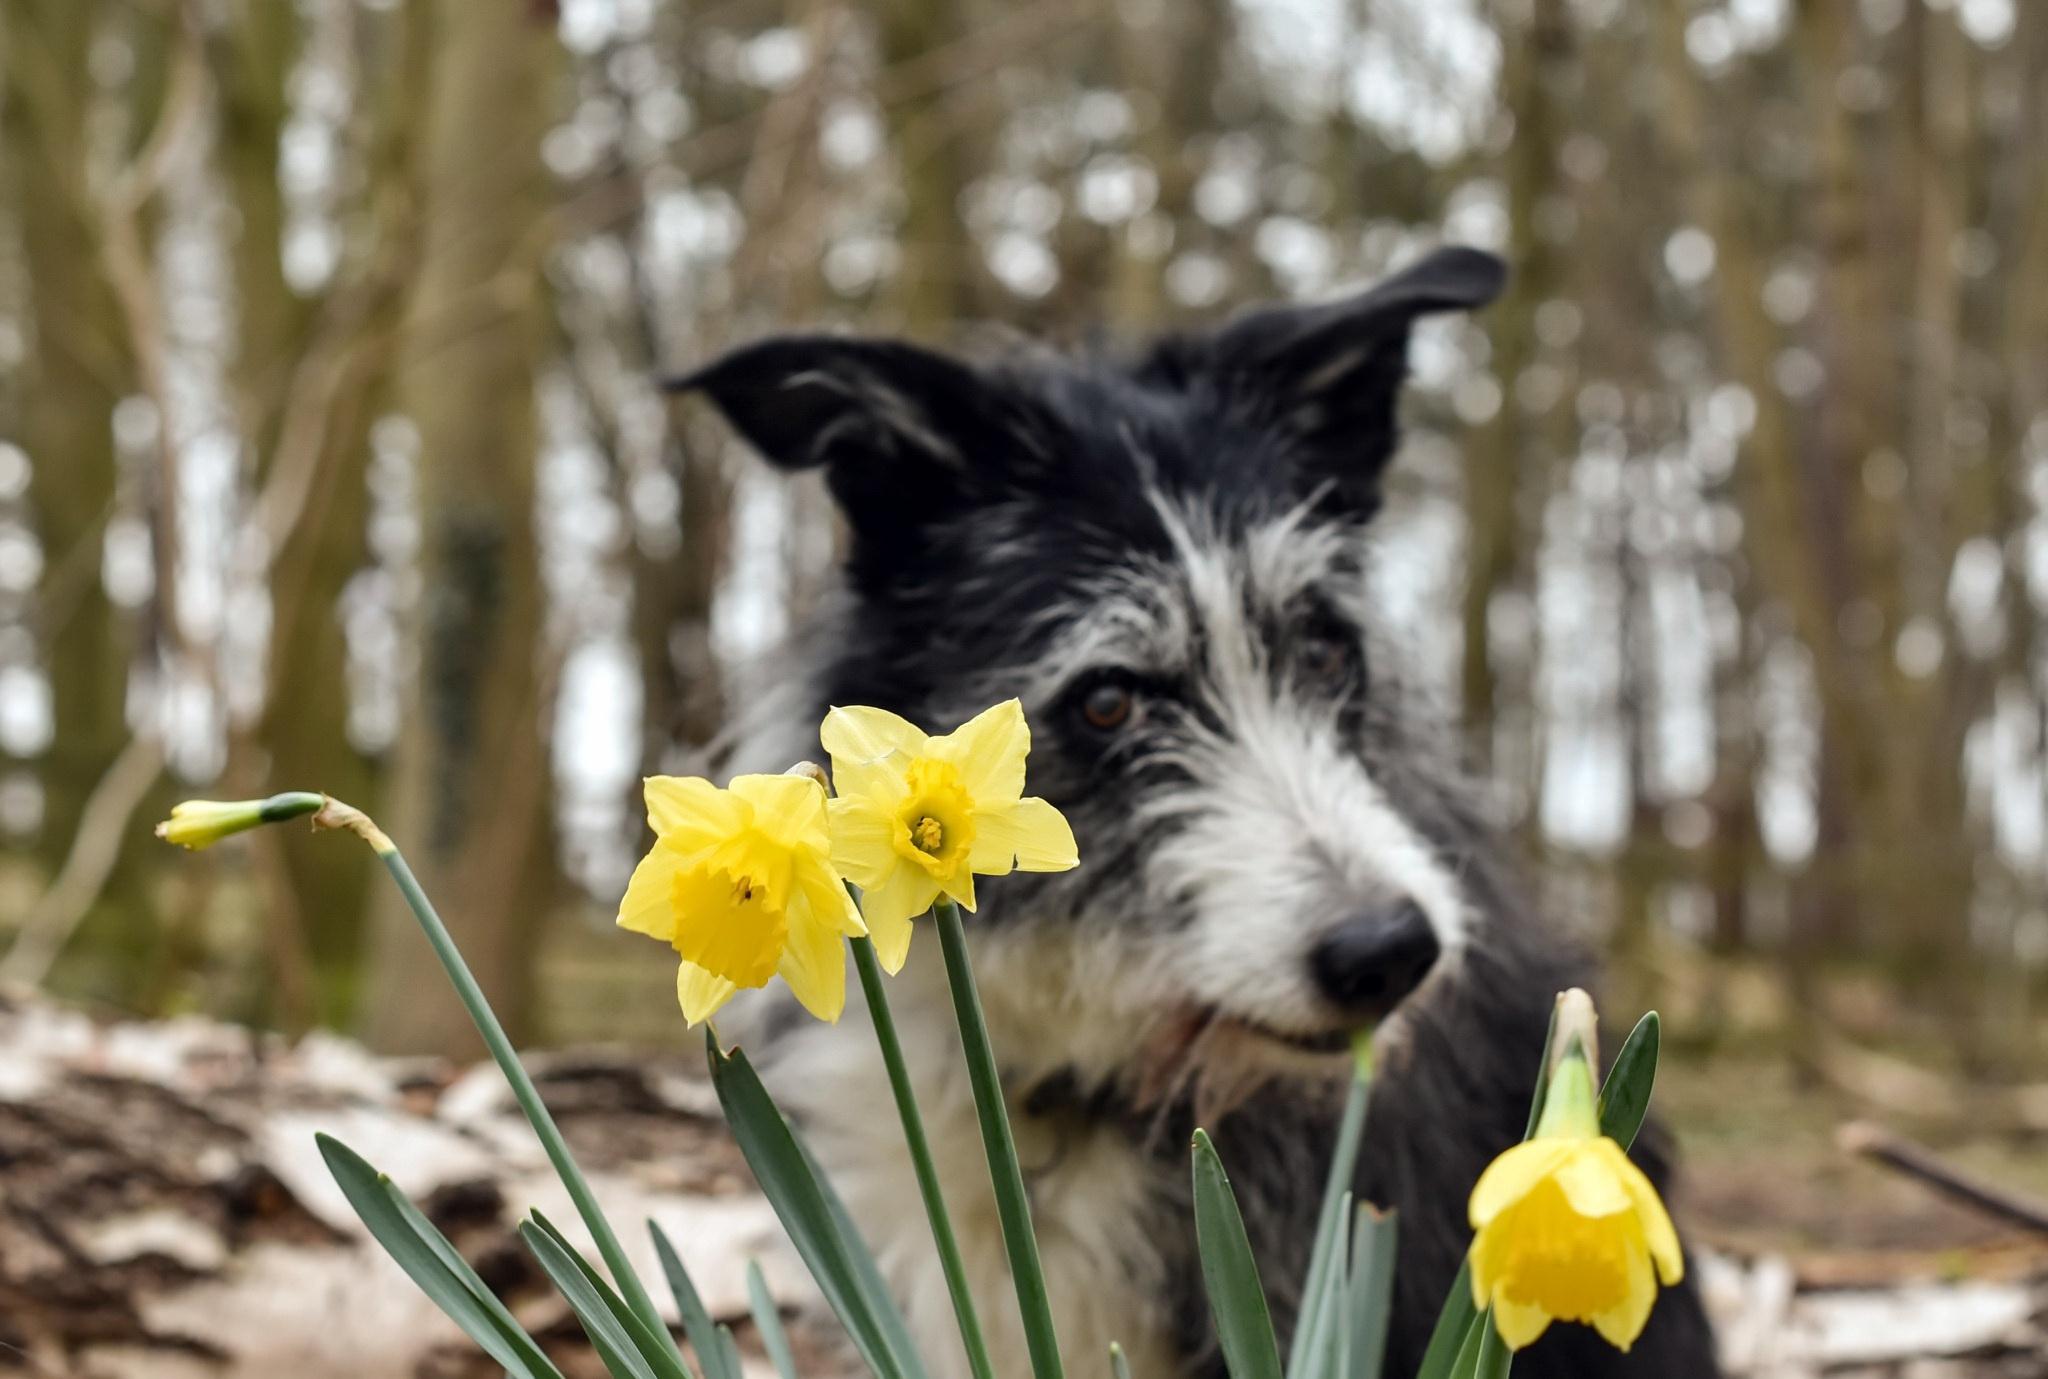 весна картинки с собаками выход нетребко